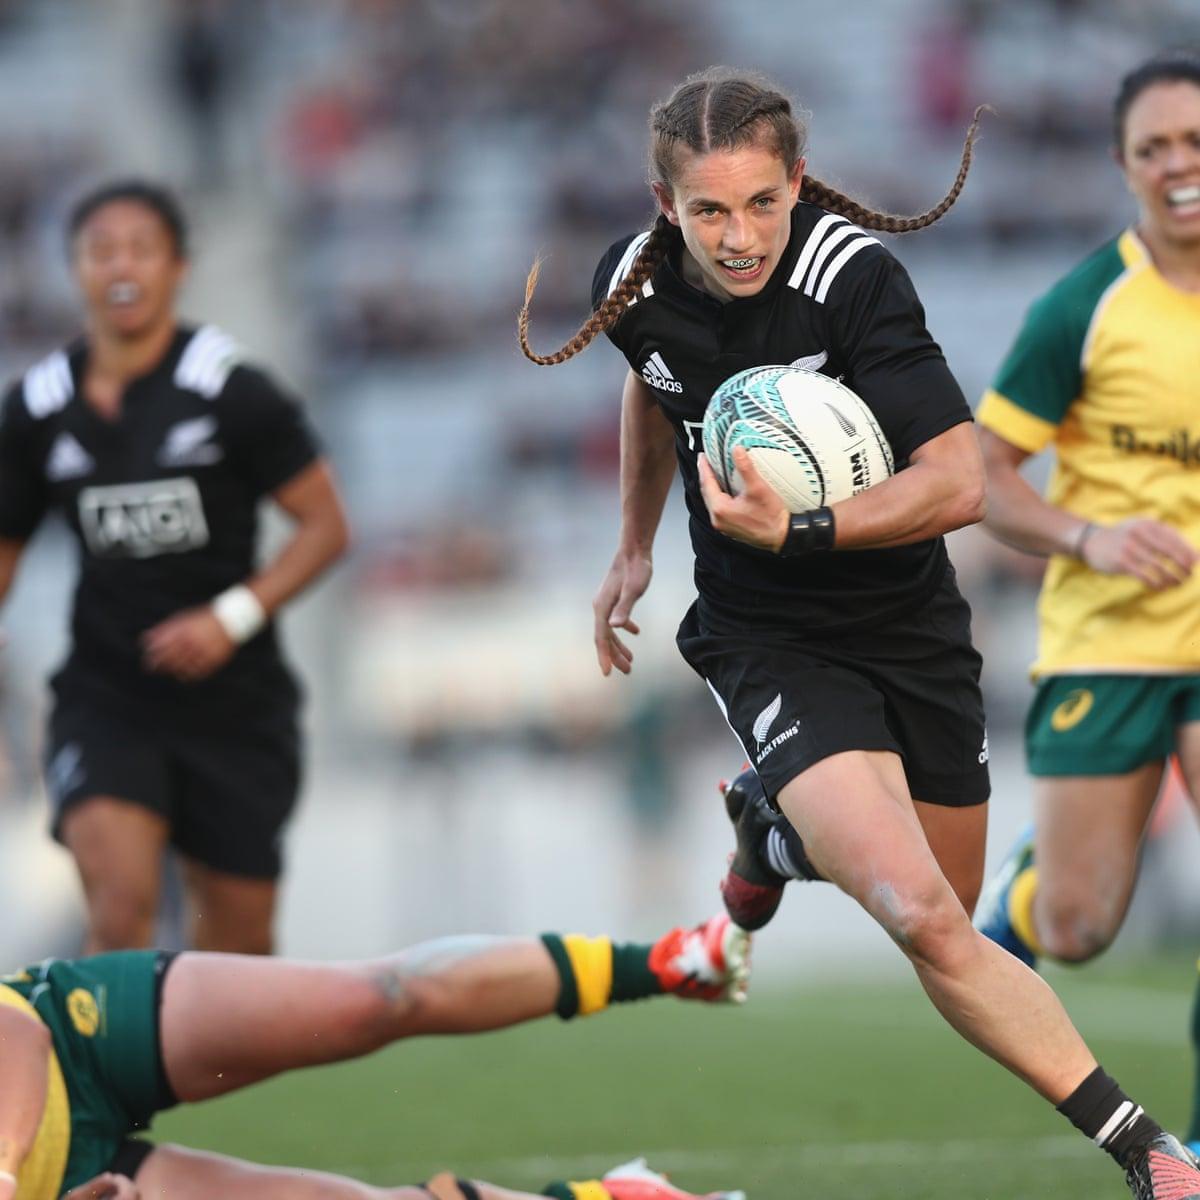 New Zealand Black Ferns Crush Australia S Wallaroos Women S Team 67 3 Rugby Union The Guardian